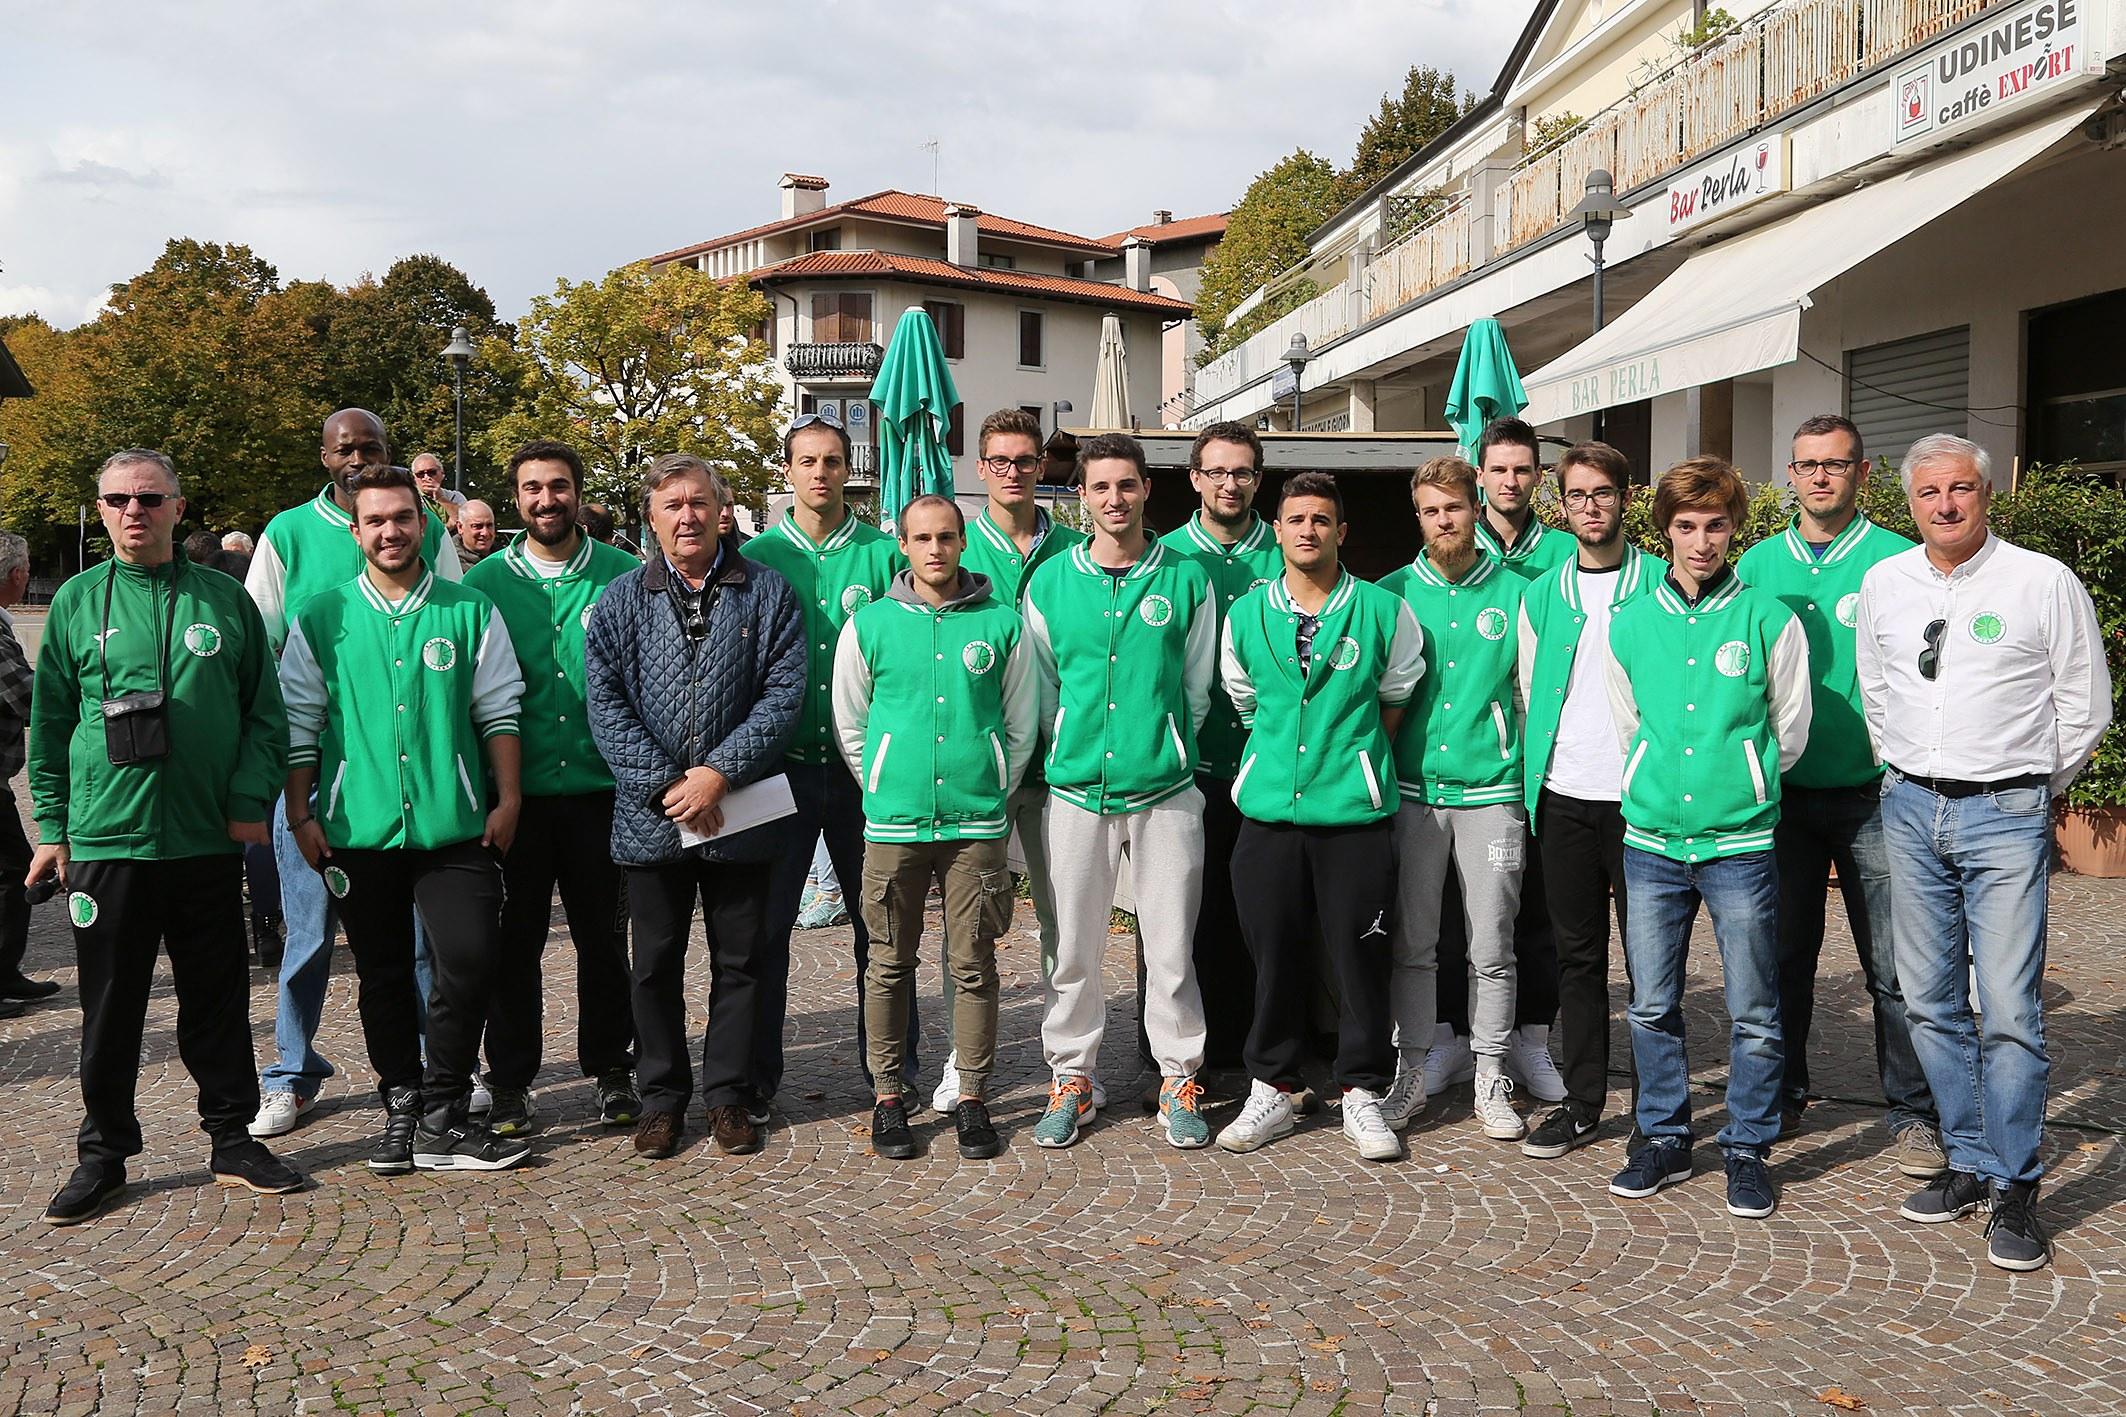 fotomenis 7016 Il Tarcento basket ha presentato la stagione sportiva 2016 17